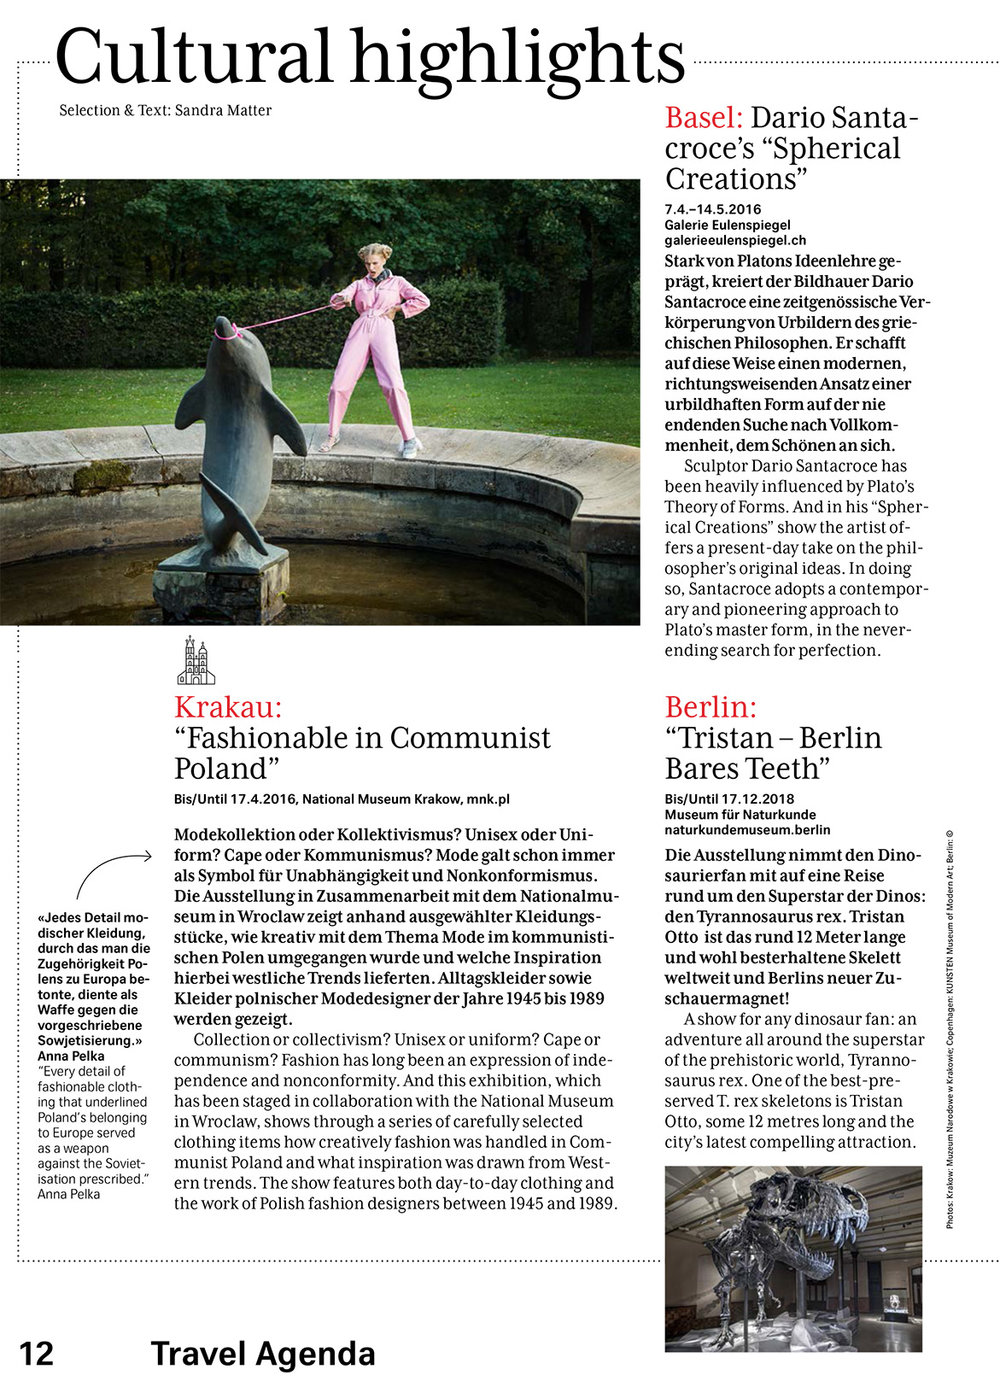 swiss magazine santacroce article.jpg